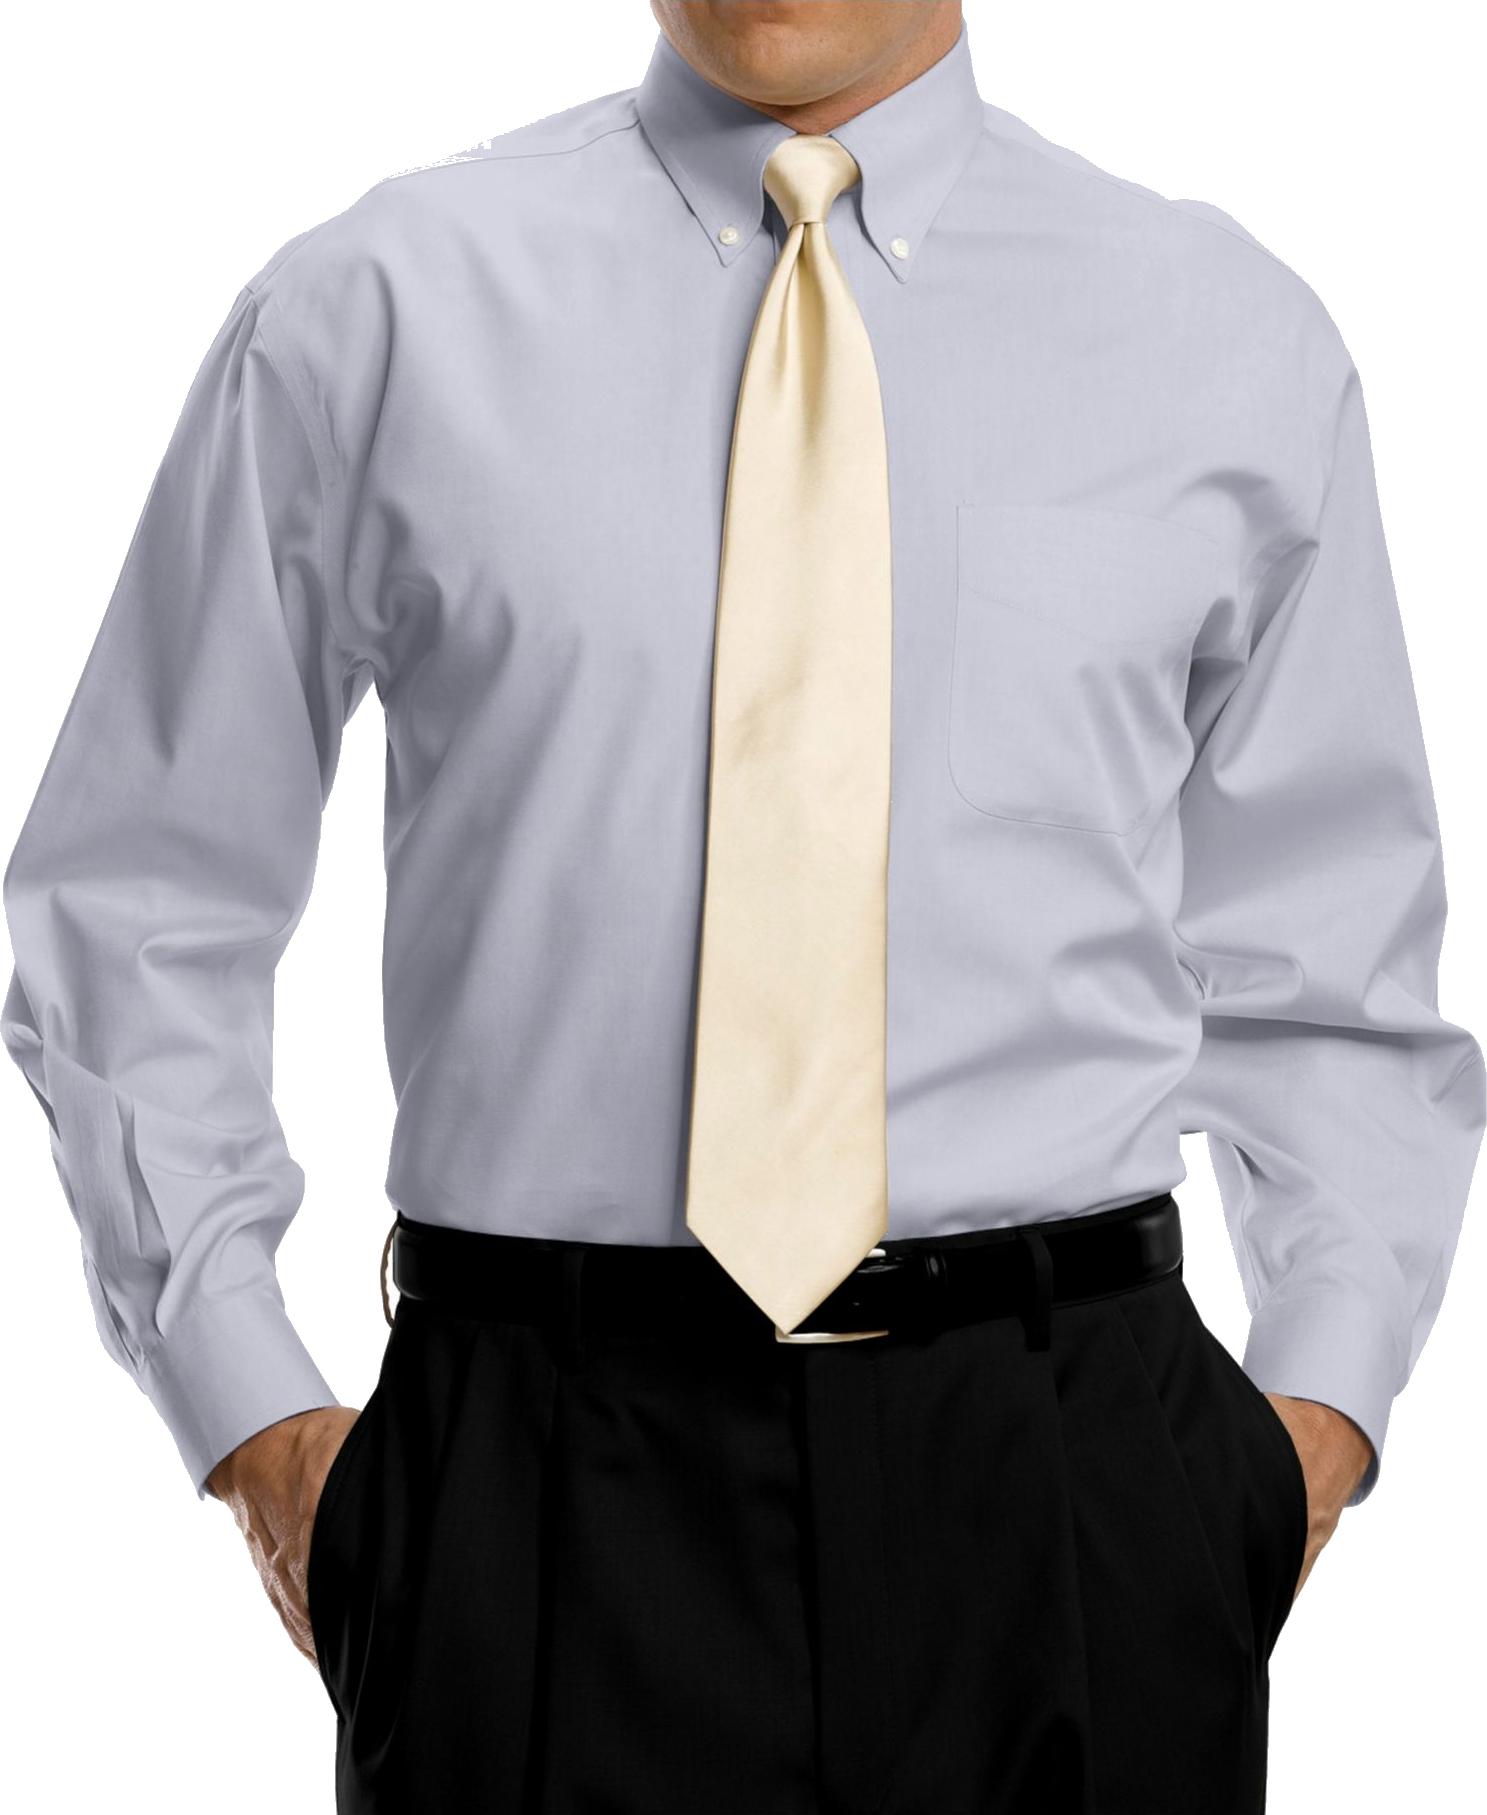 Clipart pants kid shirt. Bright grey full sleeve